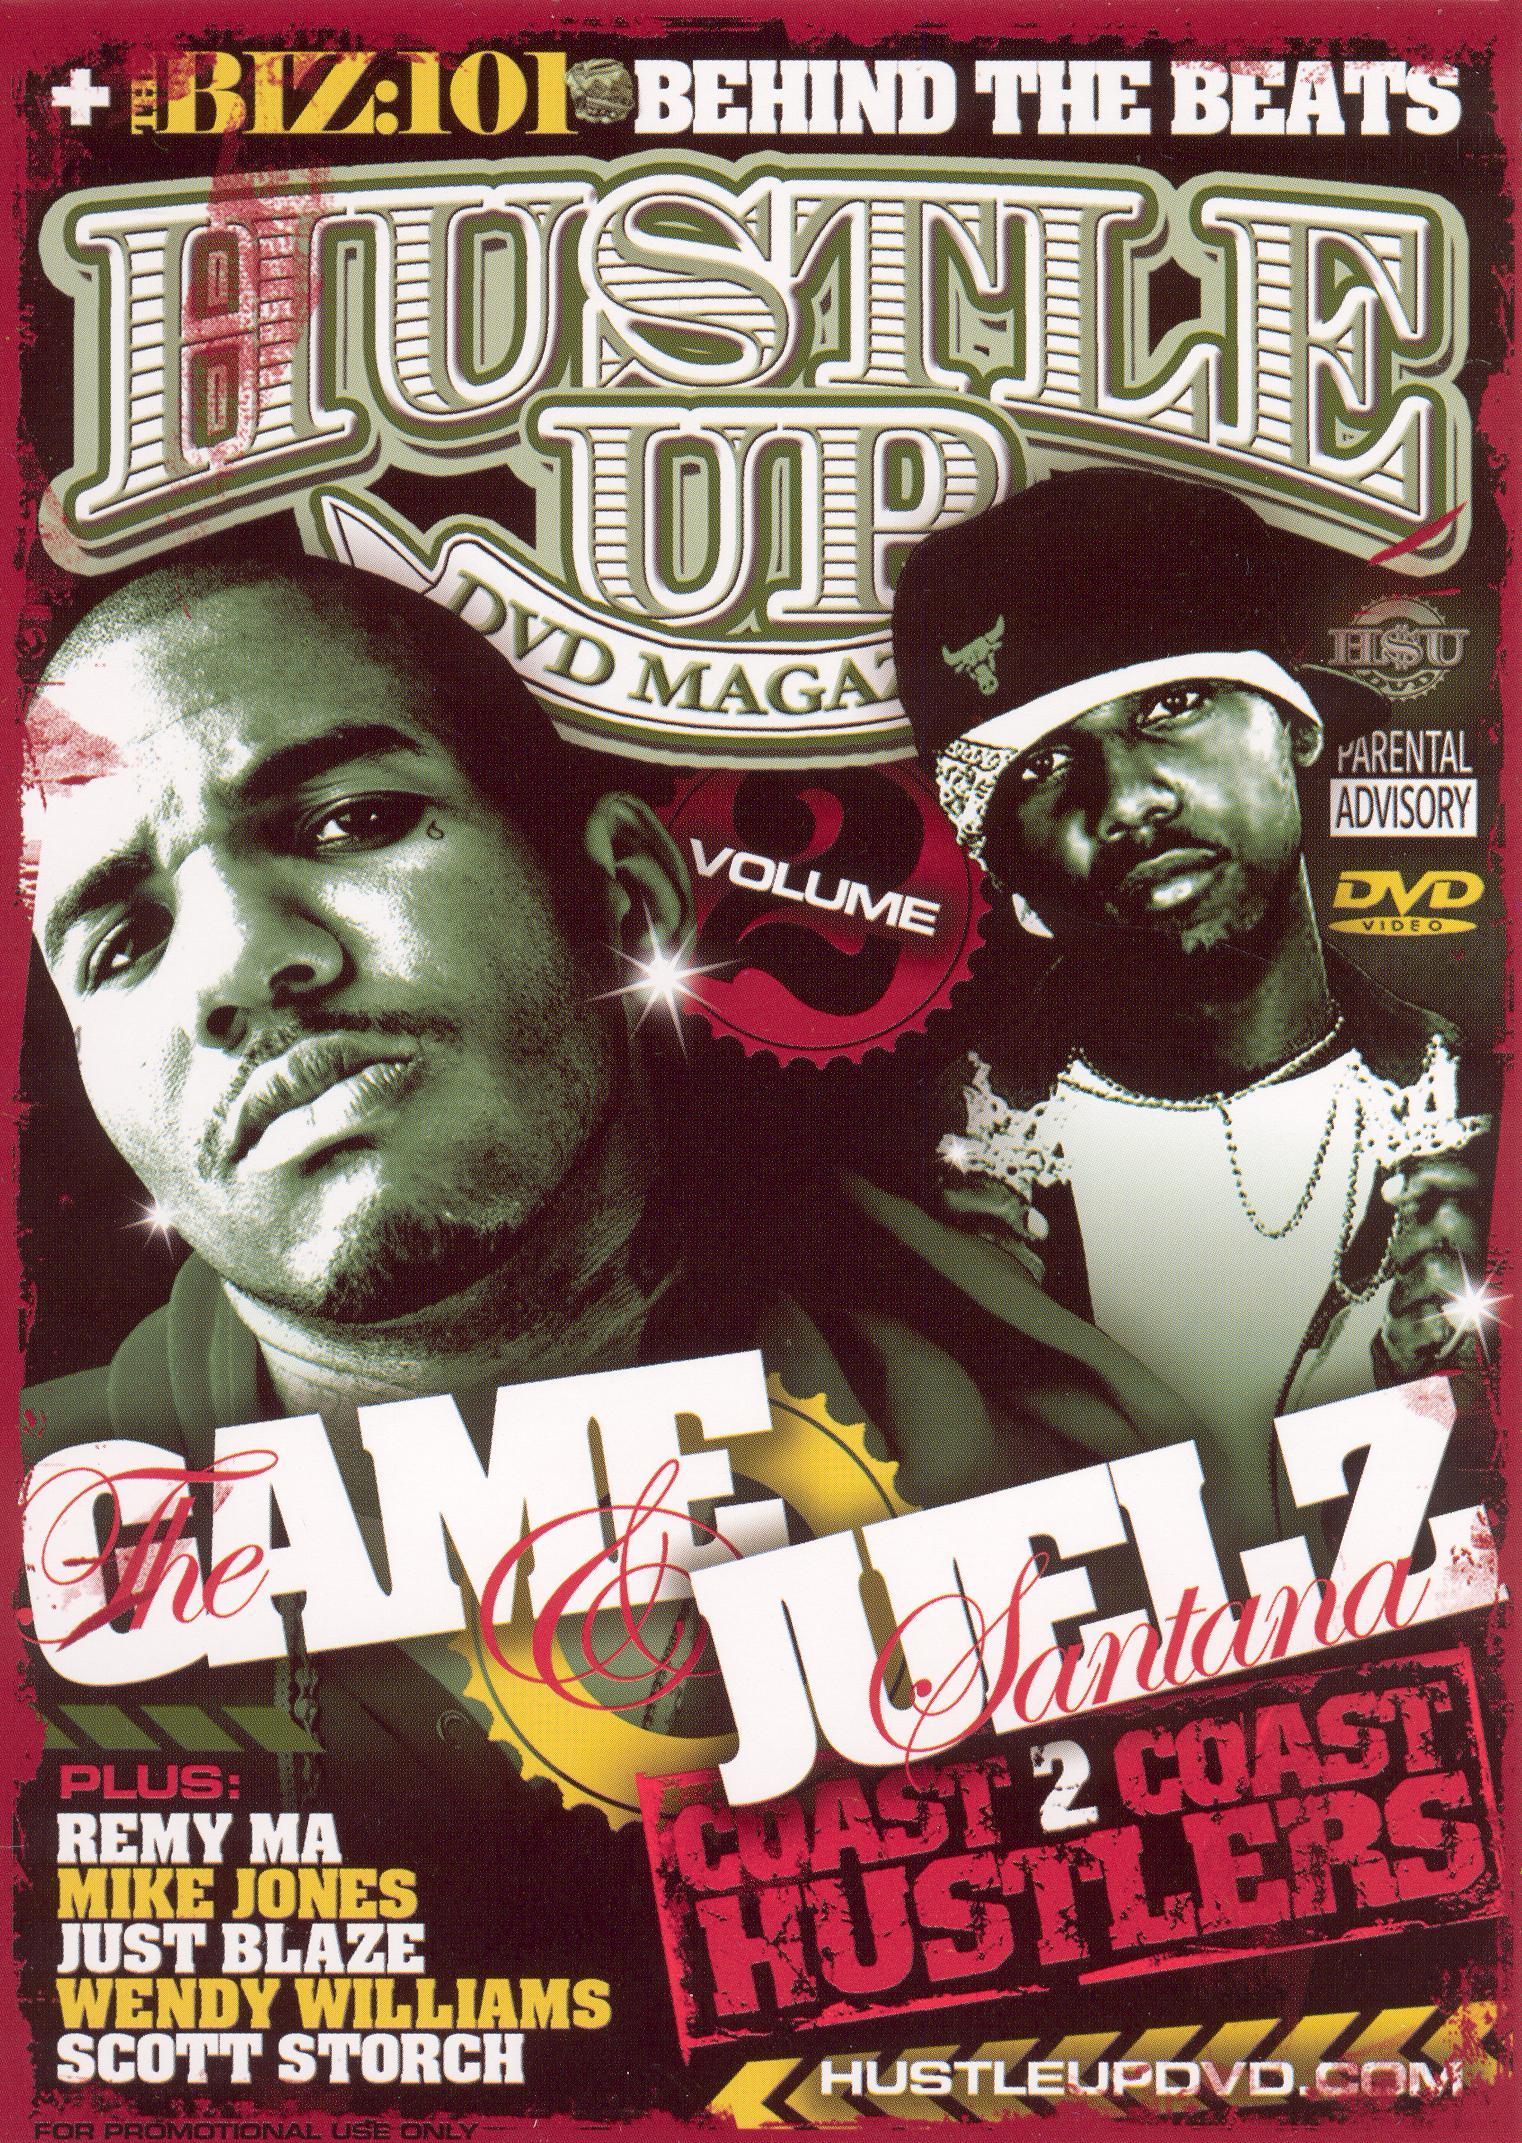 Hustle Up DVD Magazine, Vol. 2